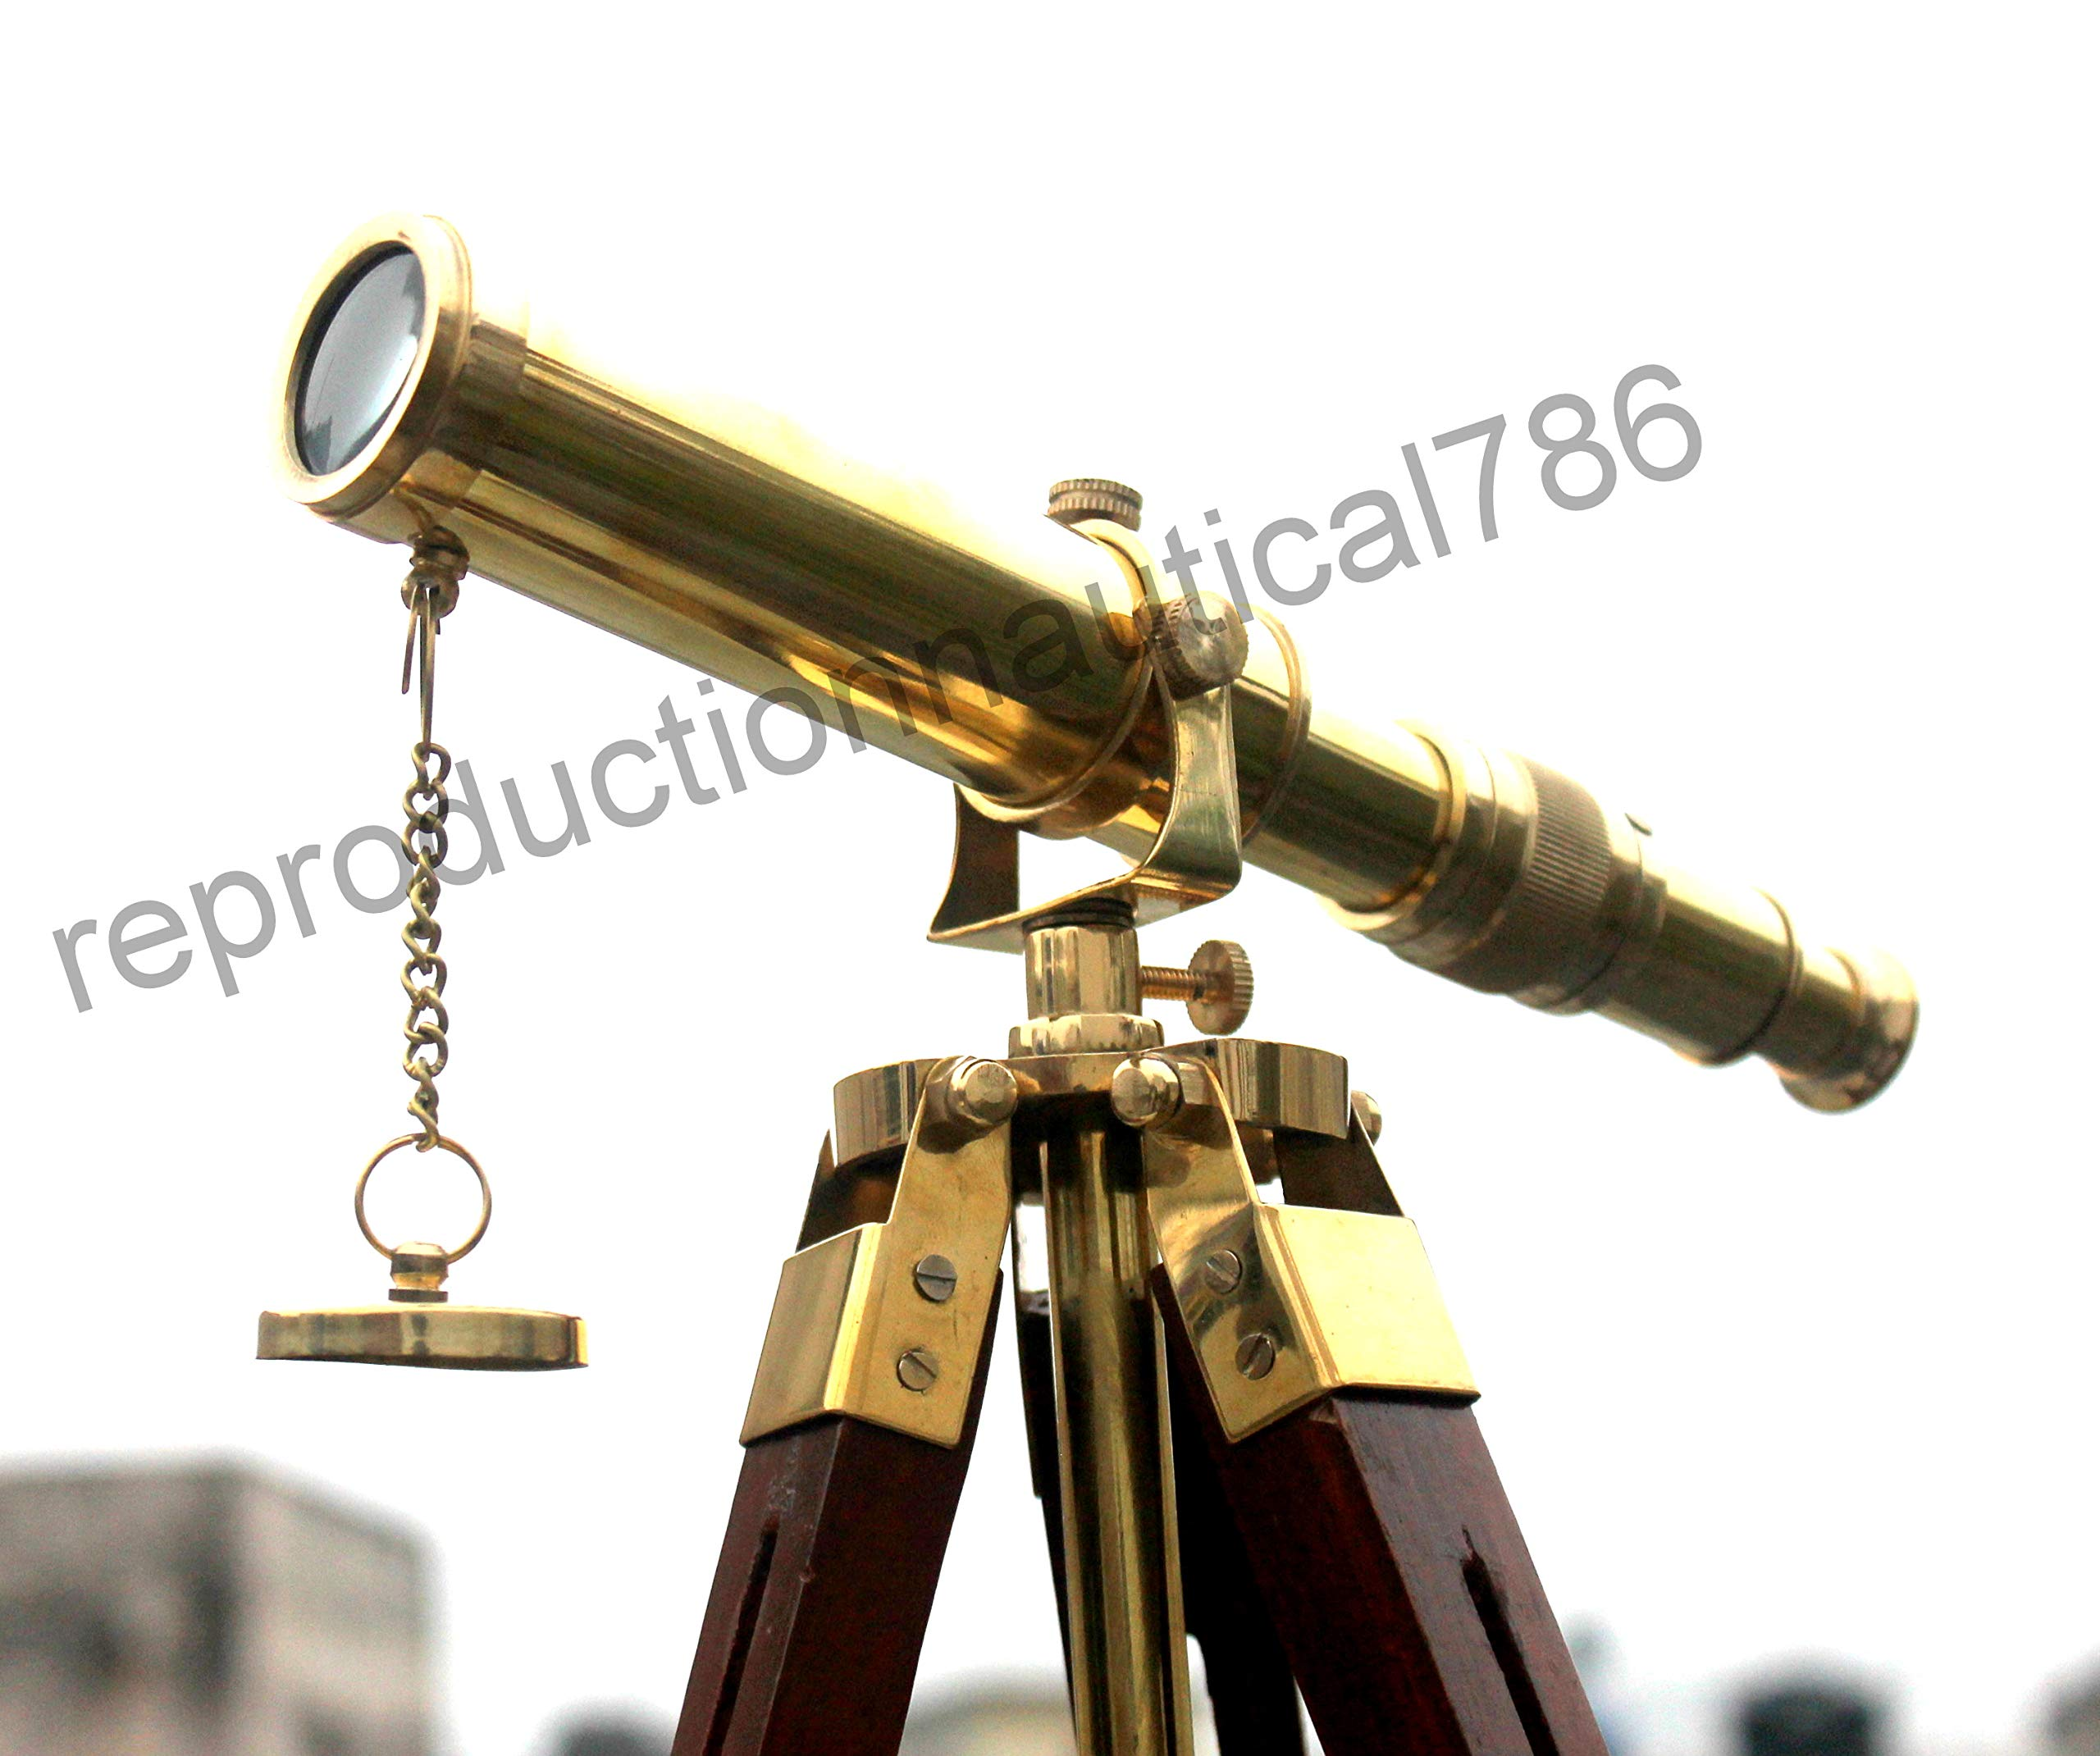 Antique Solid Brass Spy Glass Telescope Handmade Marine Navy Ship Telescope with Wood Tripod Desk Balcony Decorative Vintage Scope Pirate